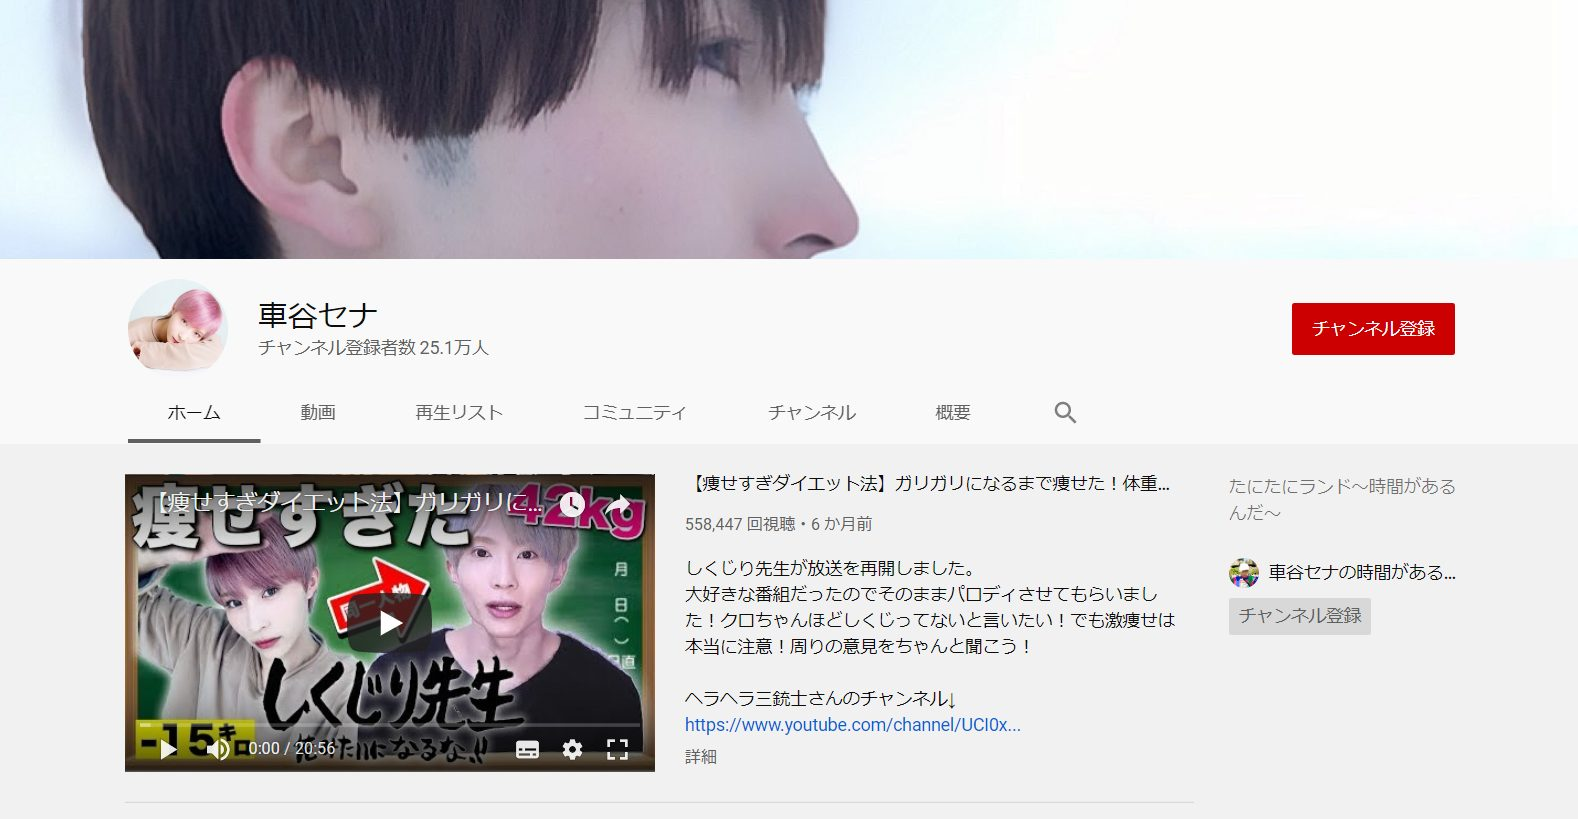 youtube-diet-influencer-kurumatani-sena